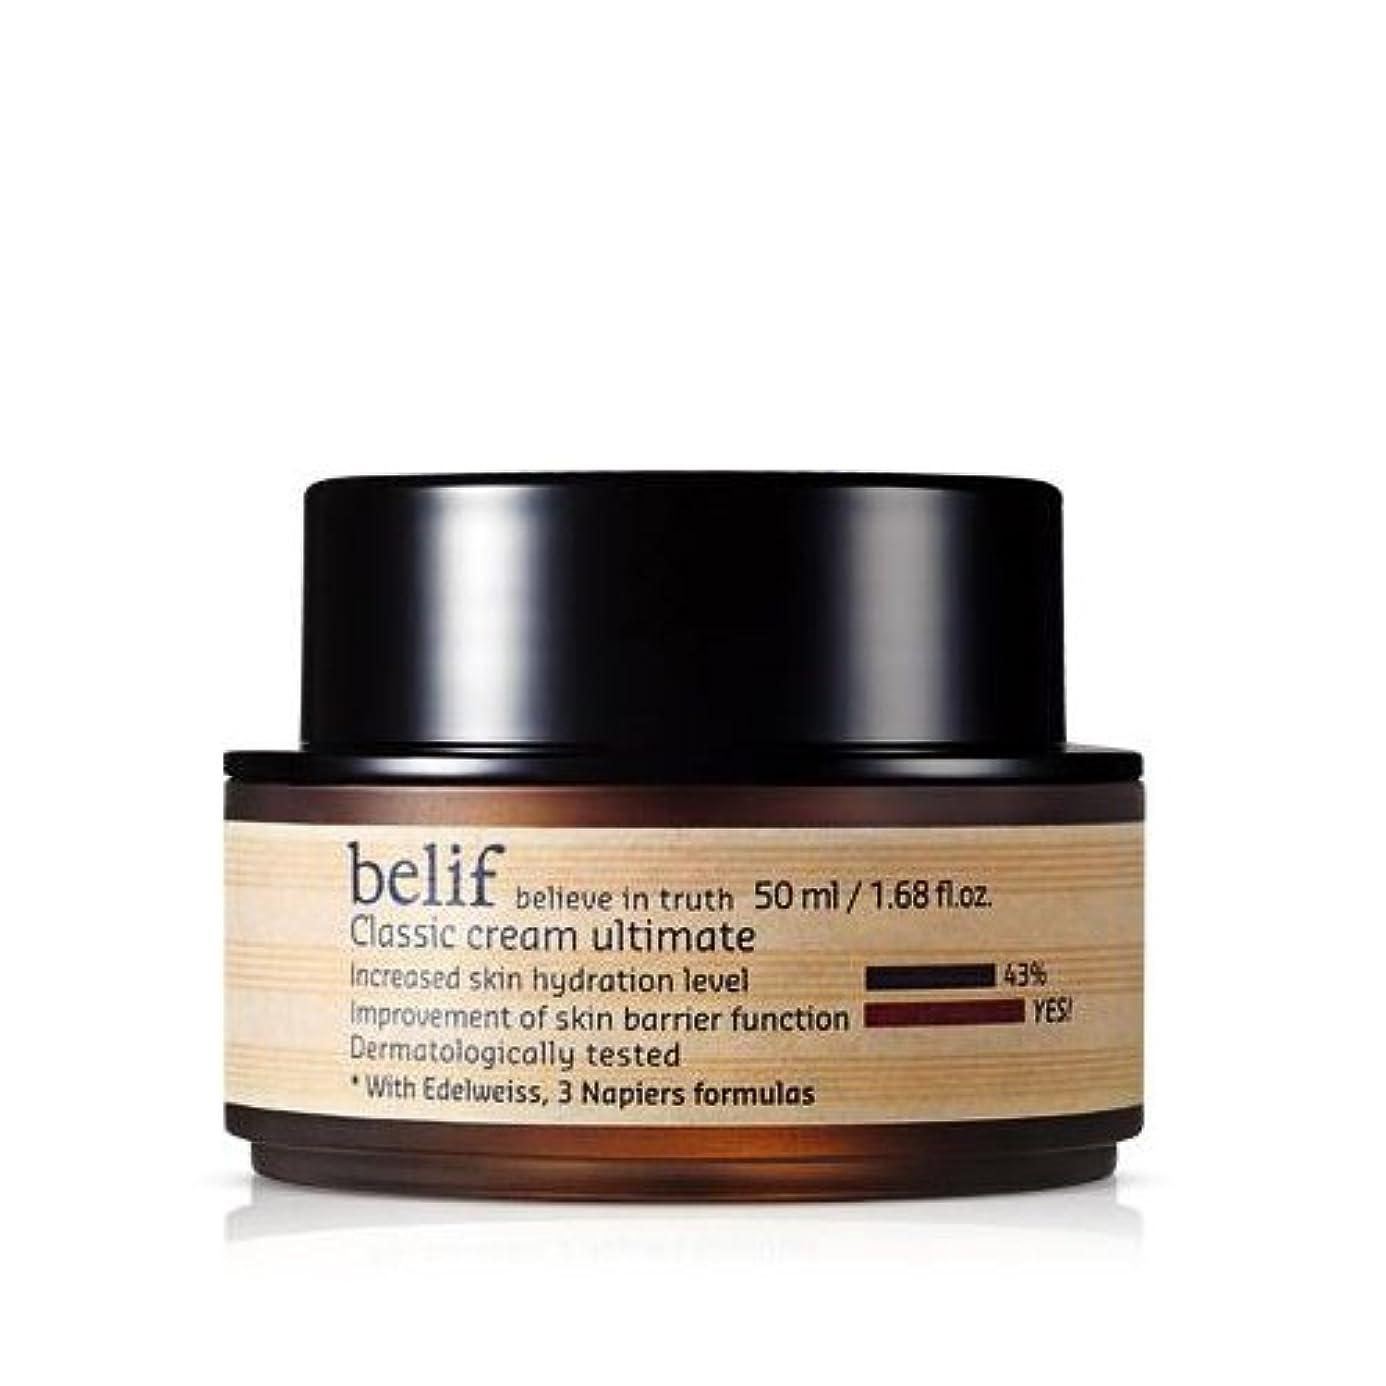 Belif(ビリーフ)クラシック クリーム アルチメイト(Classic cream ultimate)50ml